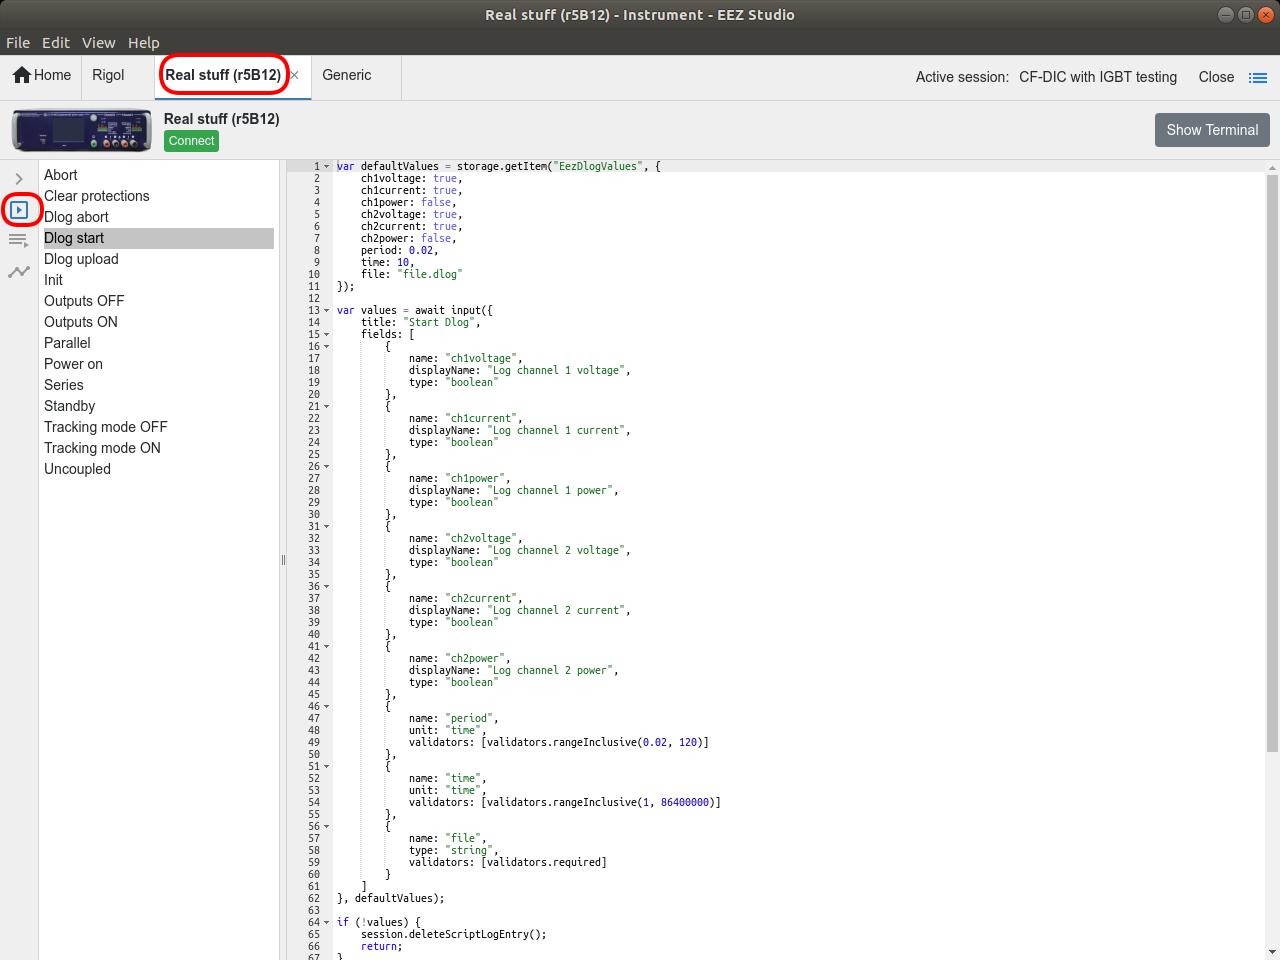 esw_instrument_scripts_tab.png